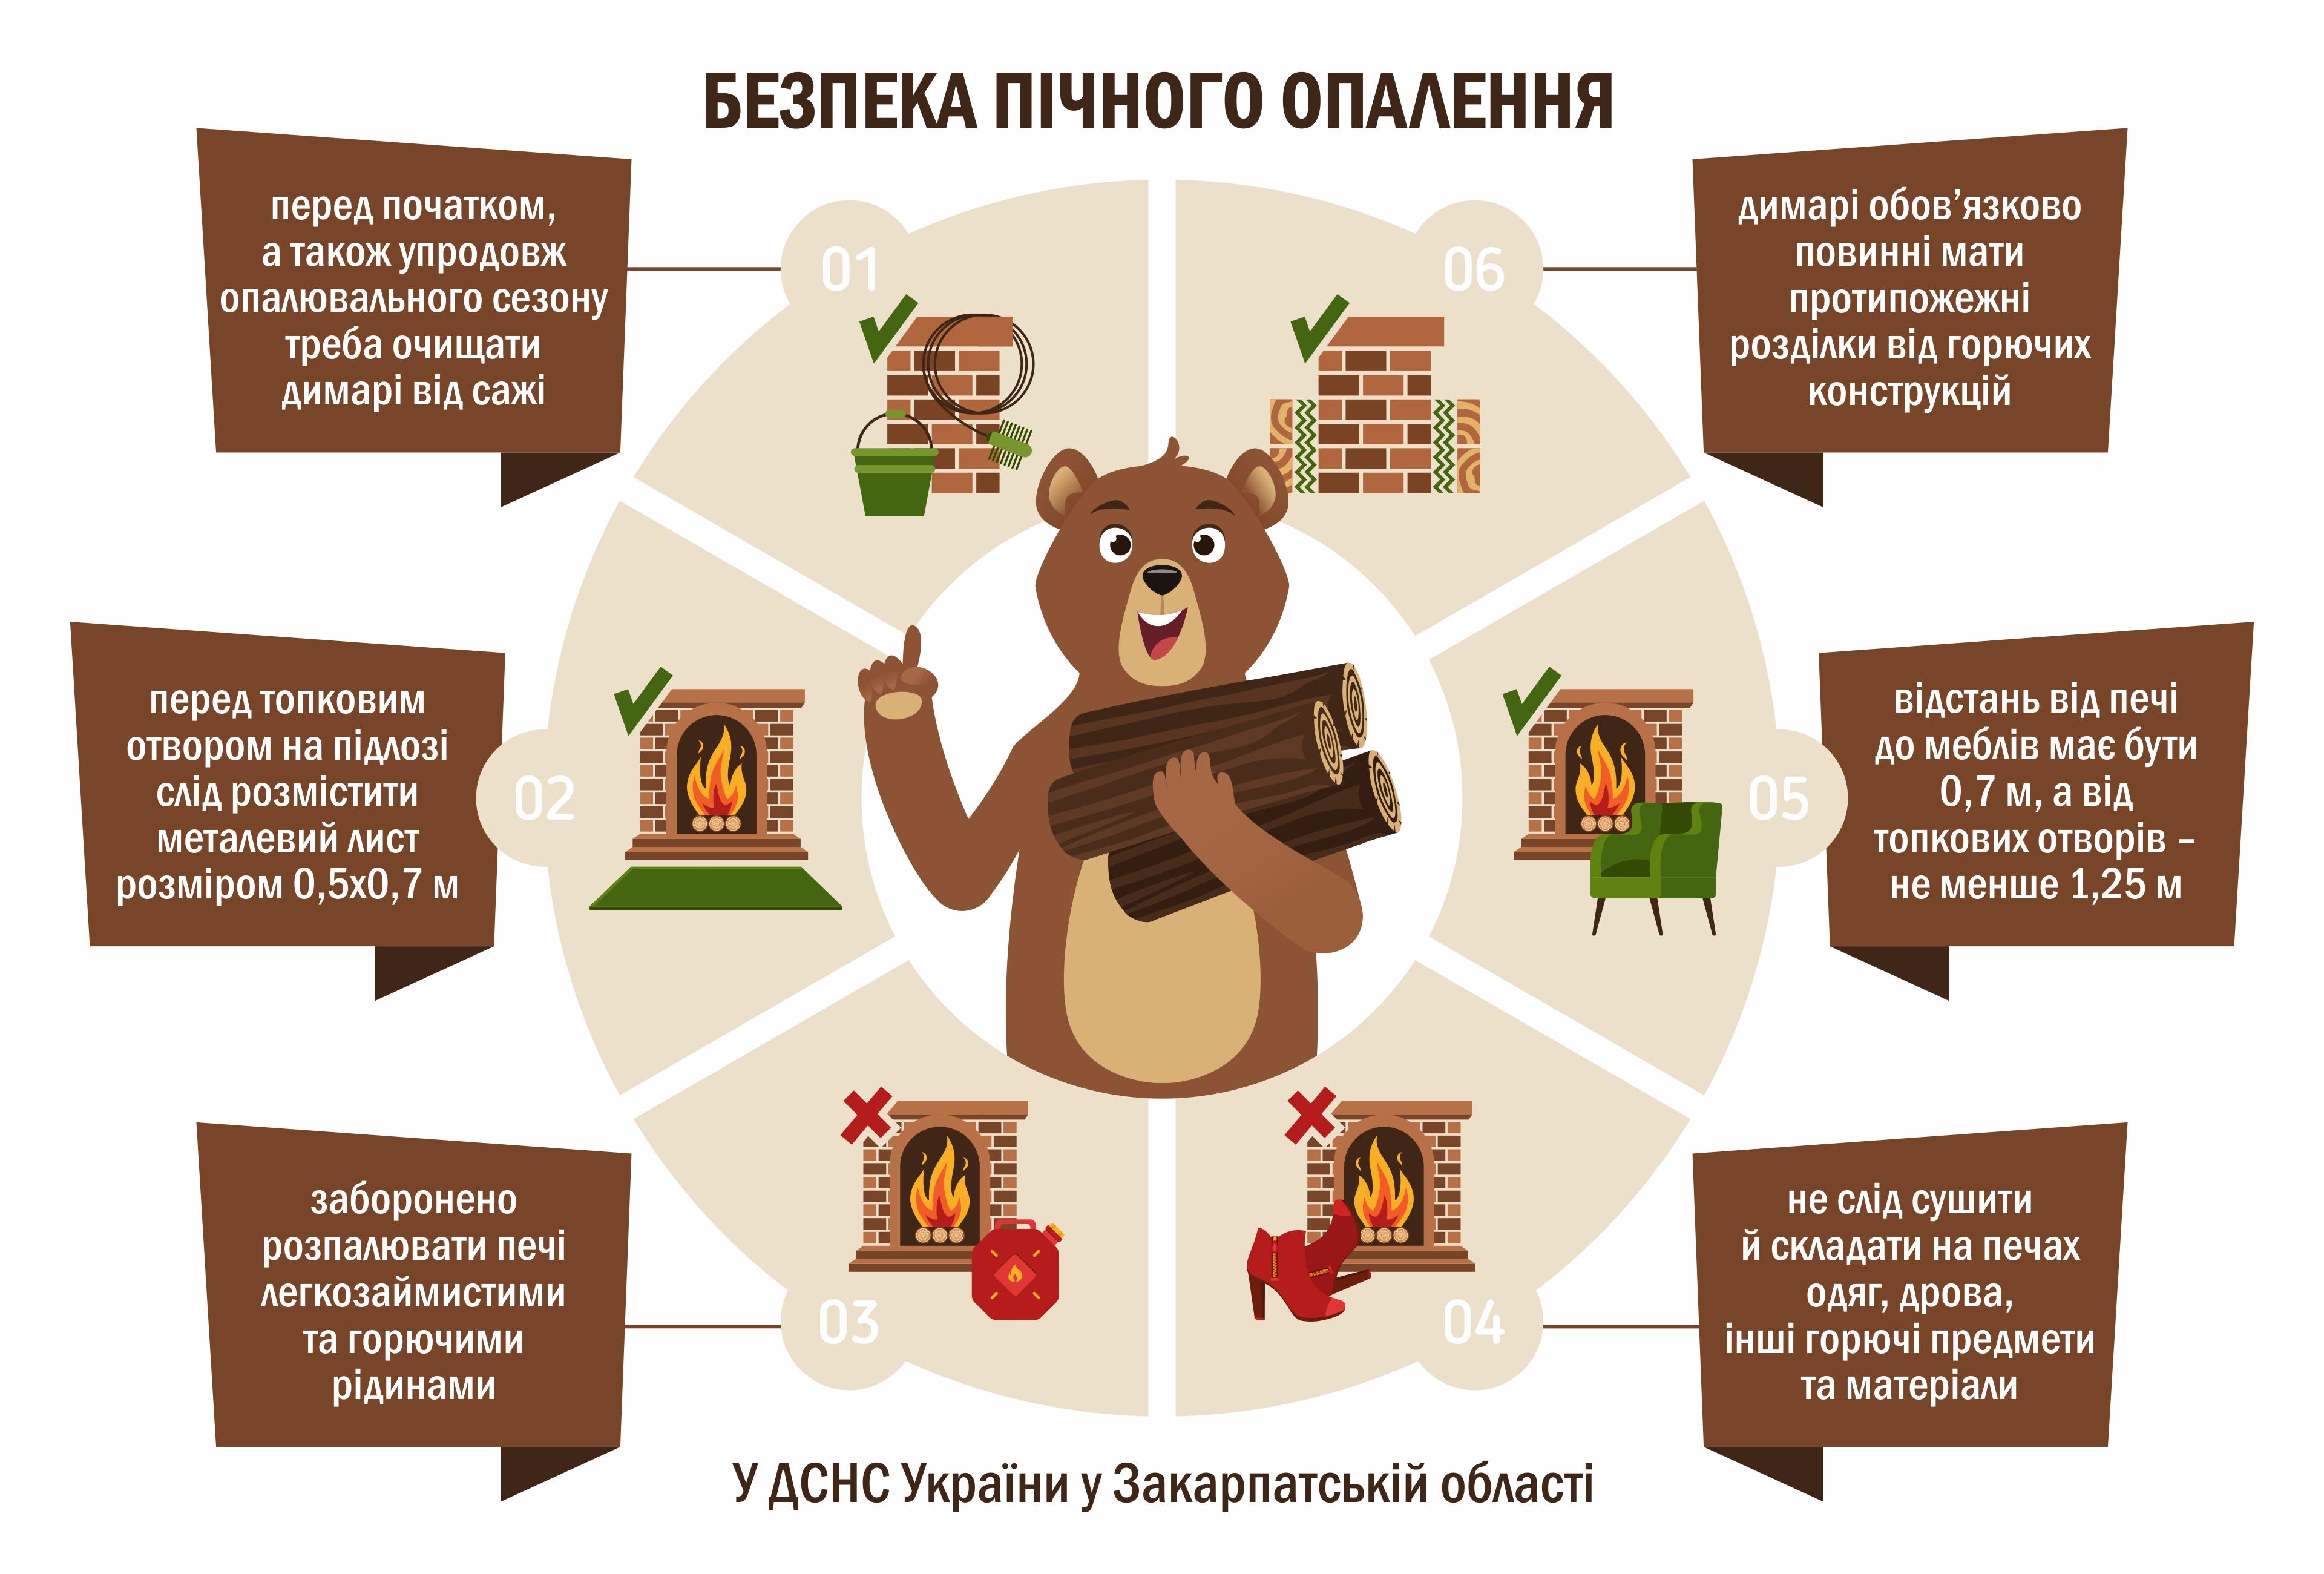 pichne_opalennya_bear.jpg